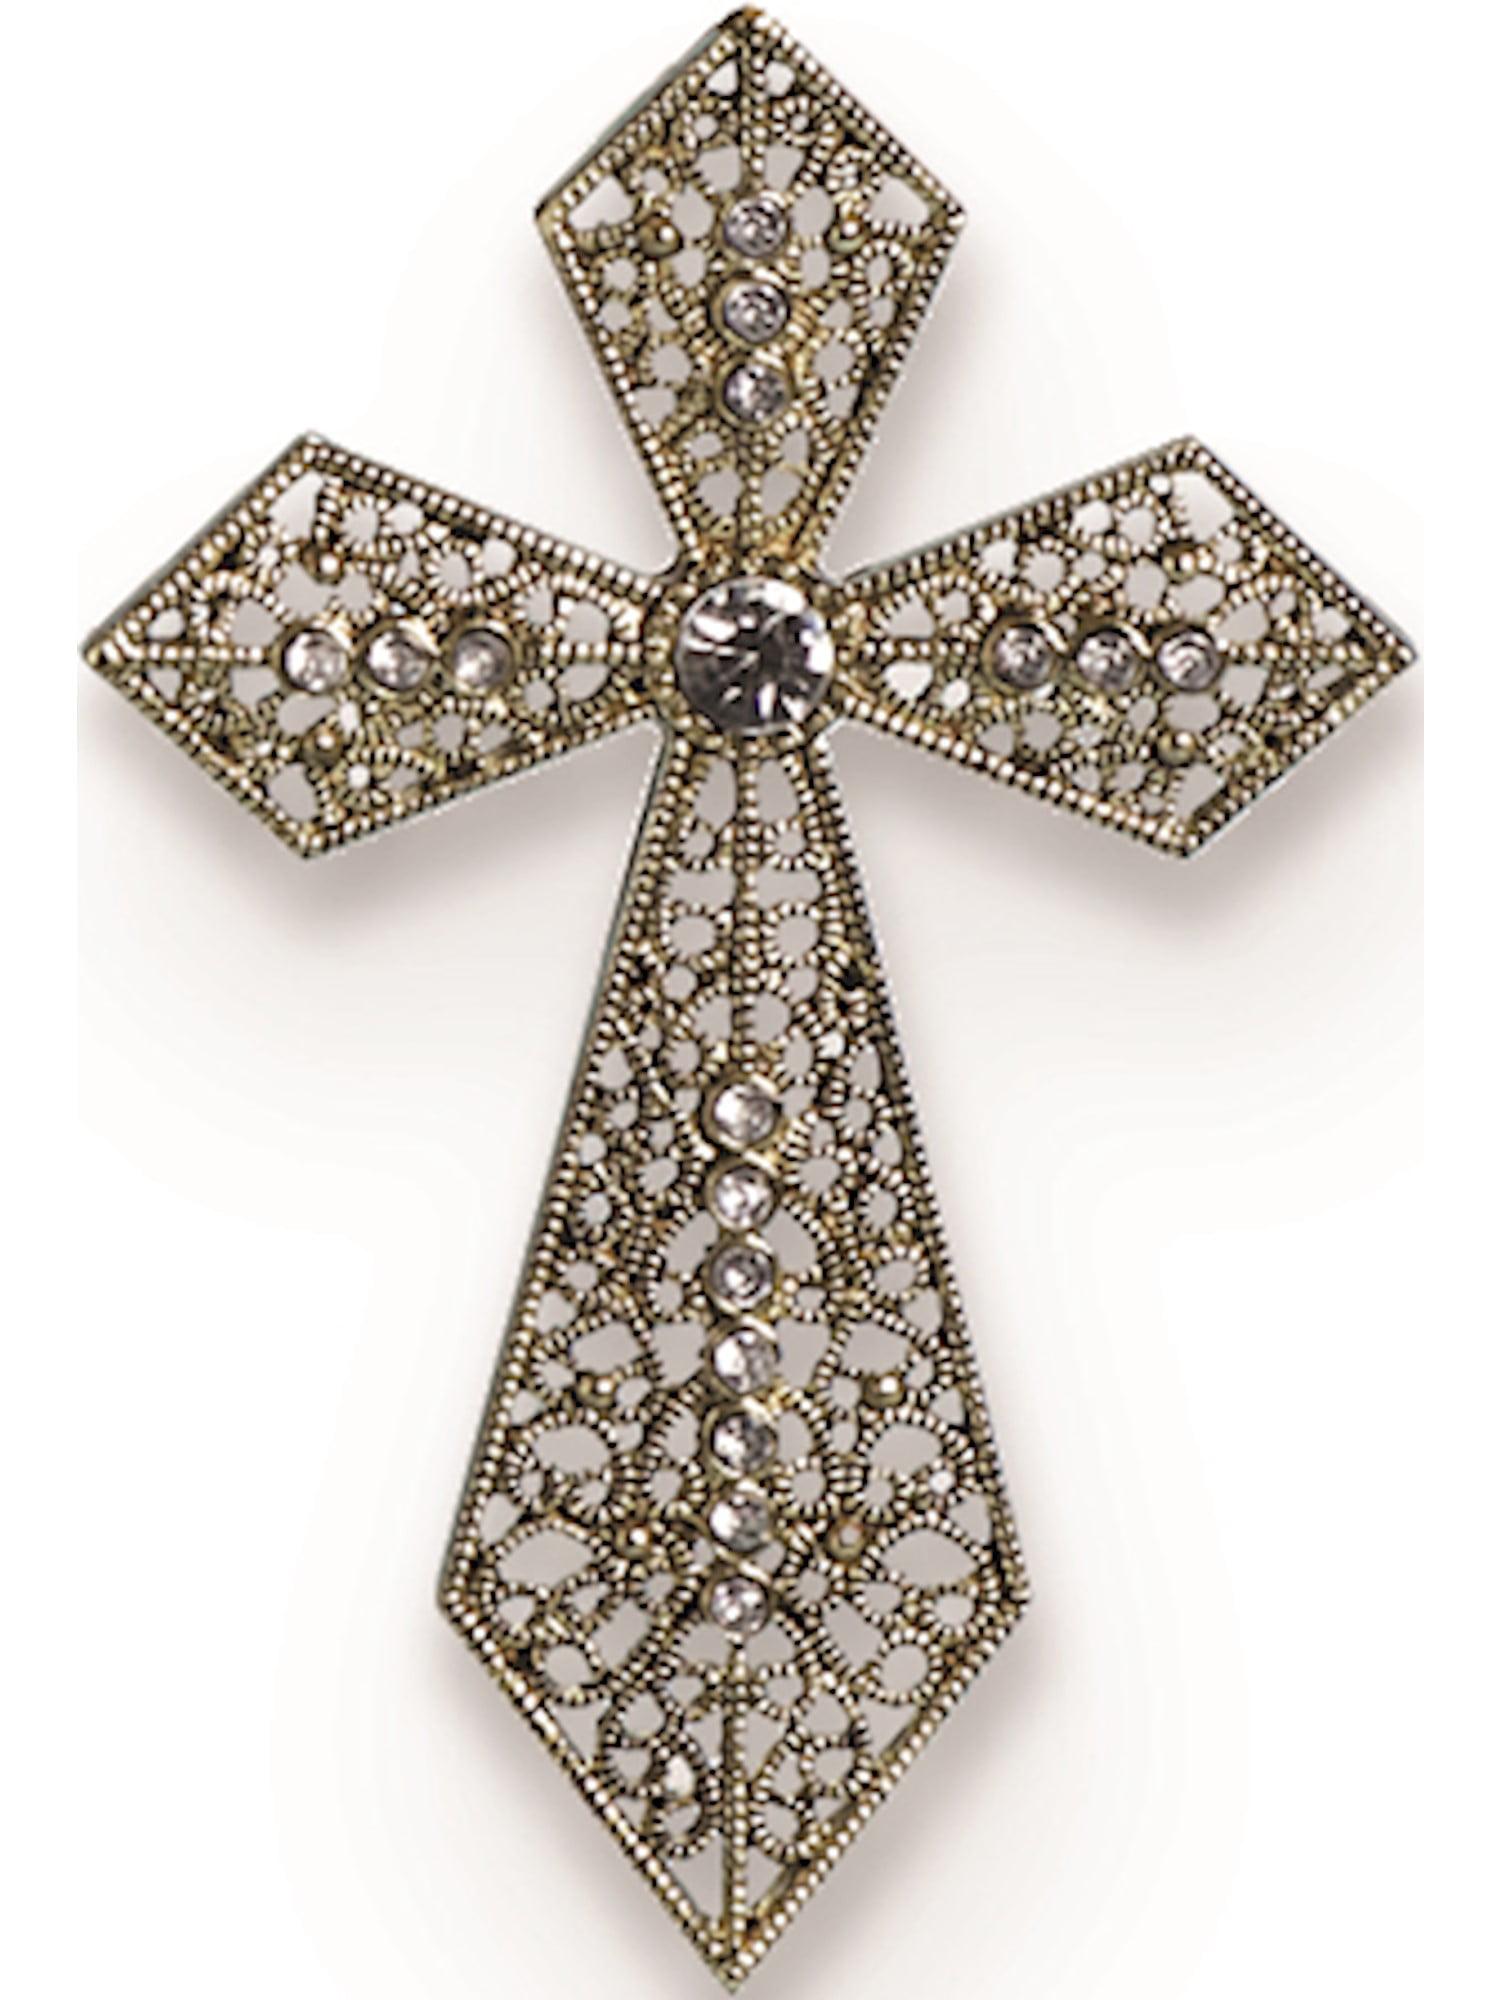 Lifes Prayer Cross Designer Jewelry by Sweet Pea